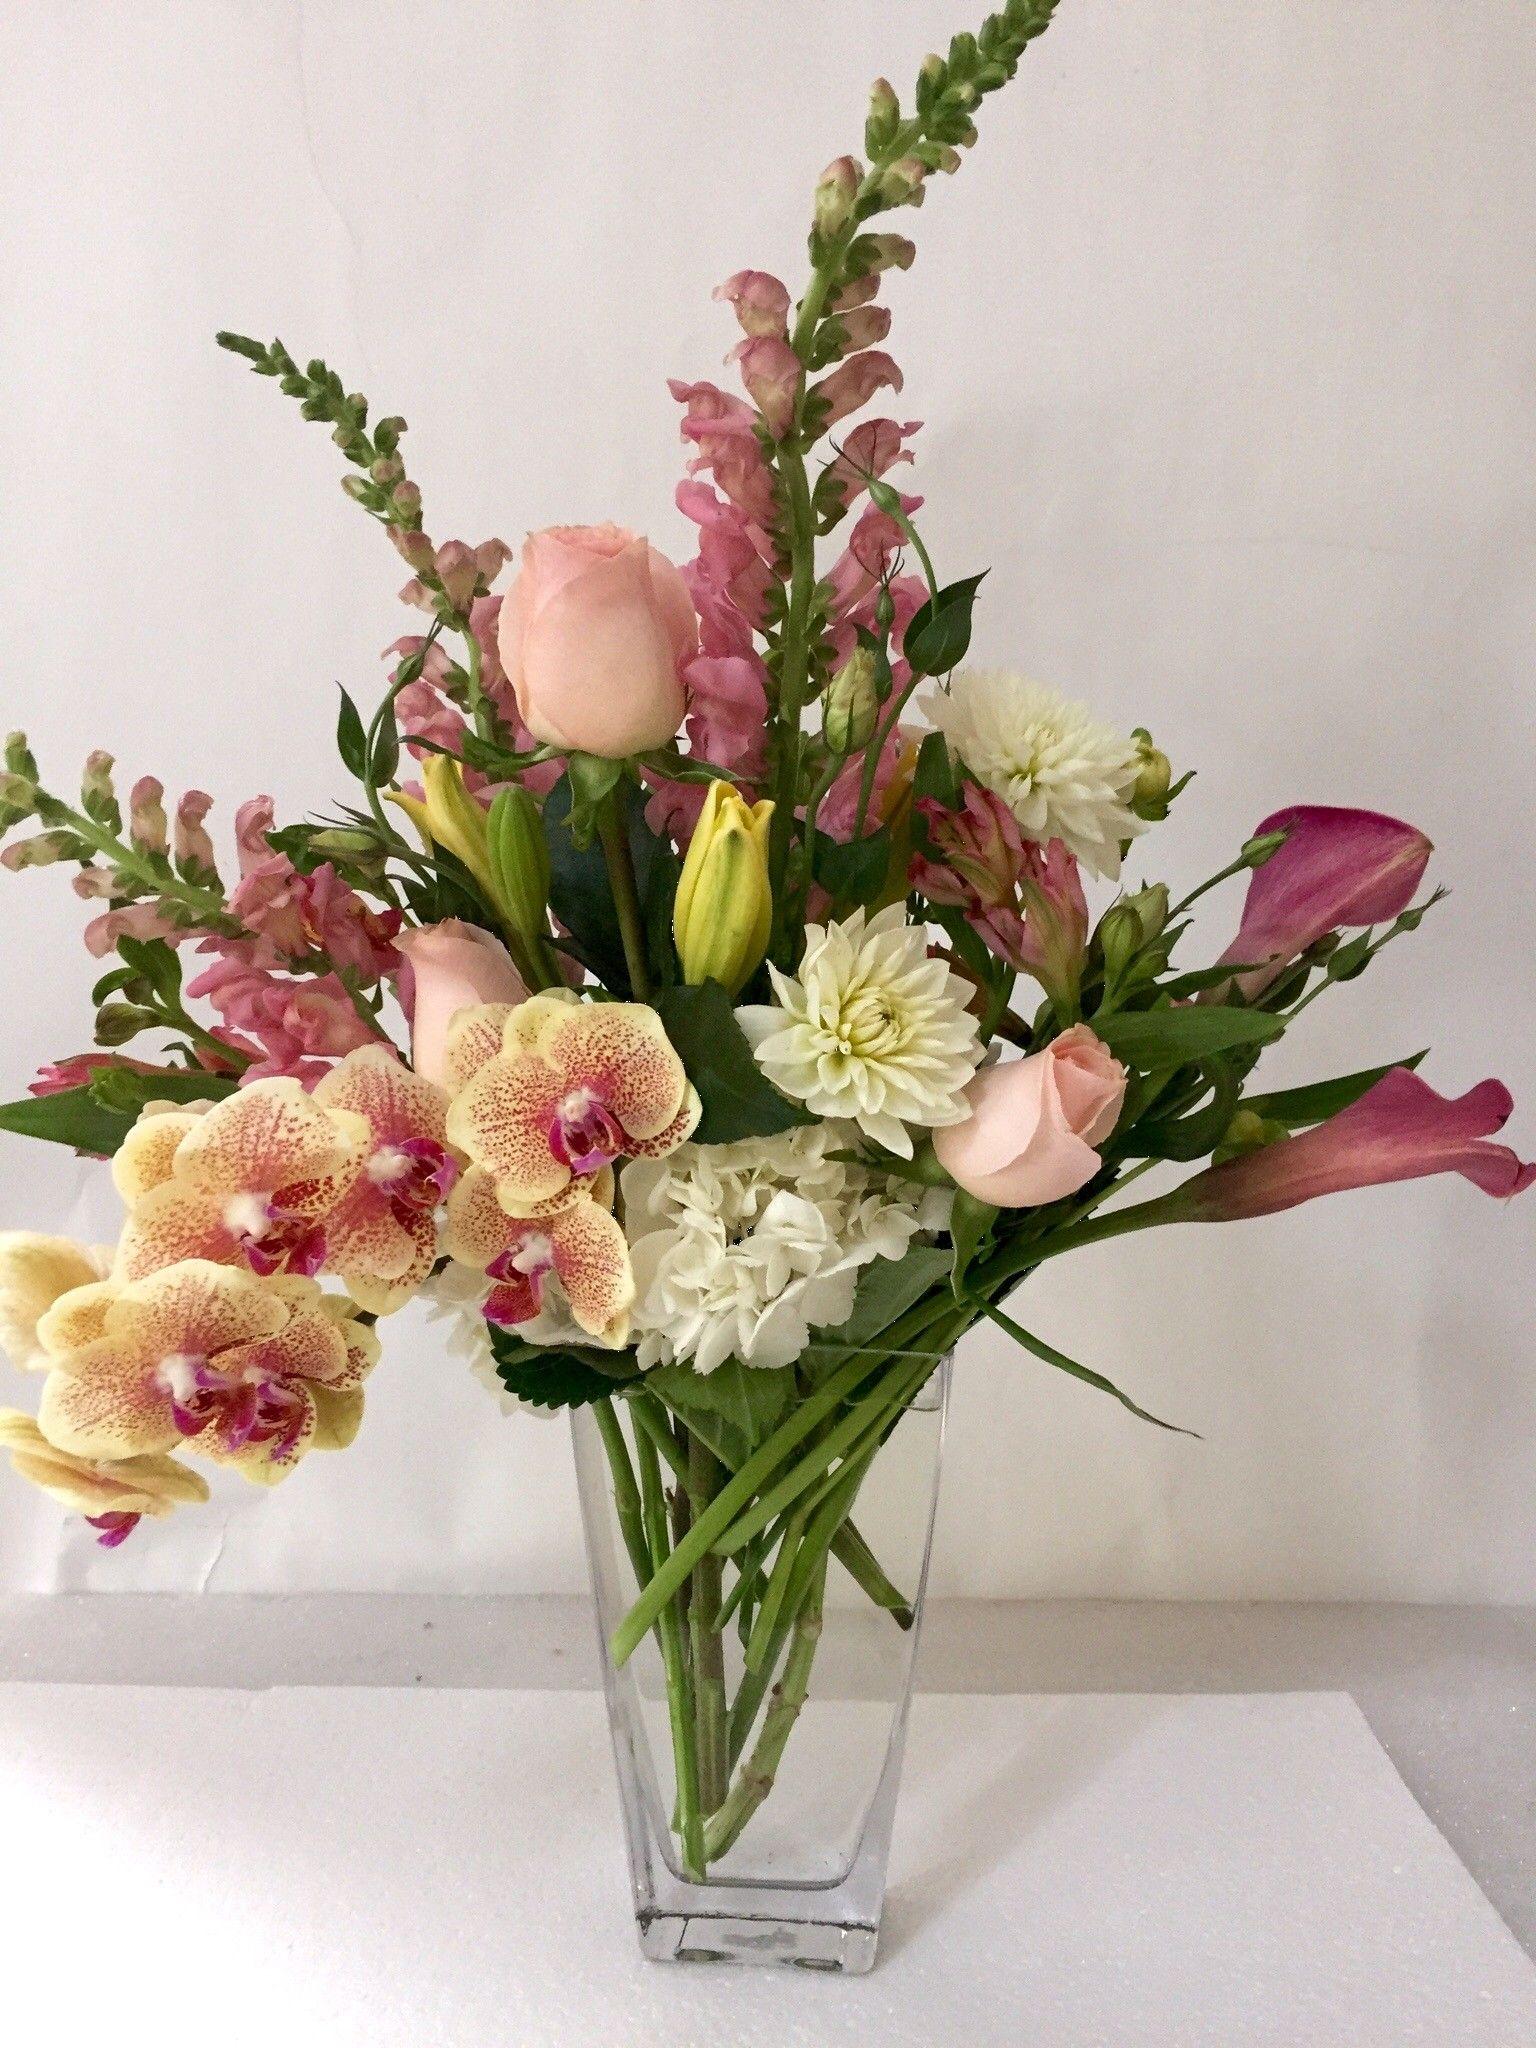 Janes Rose's & Flower Delivery San Francisco Flowers